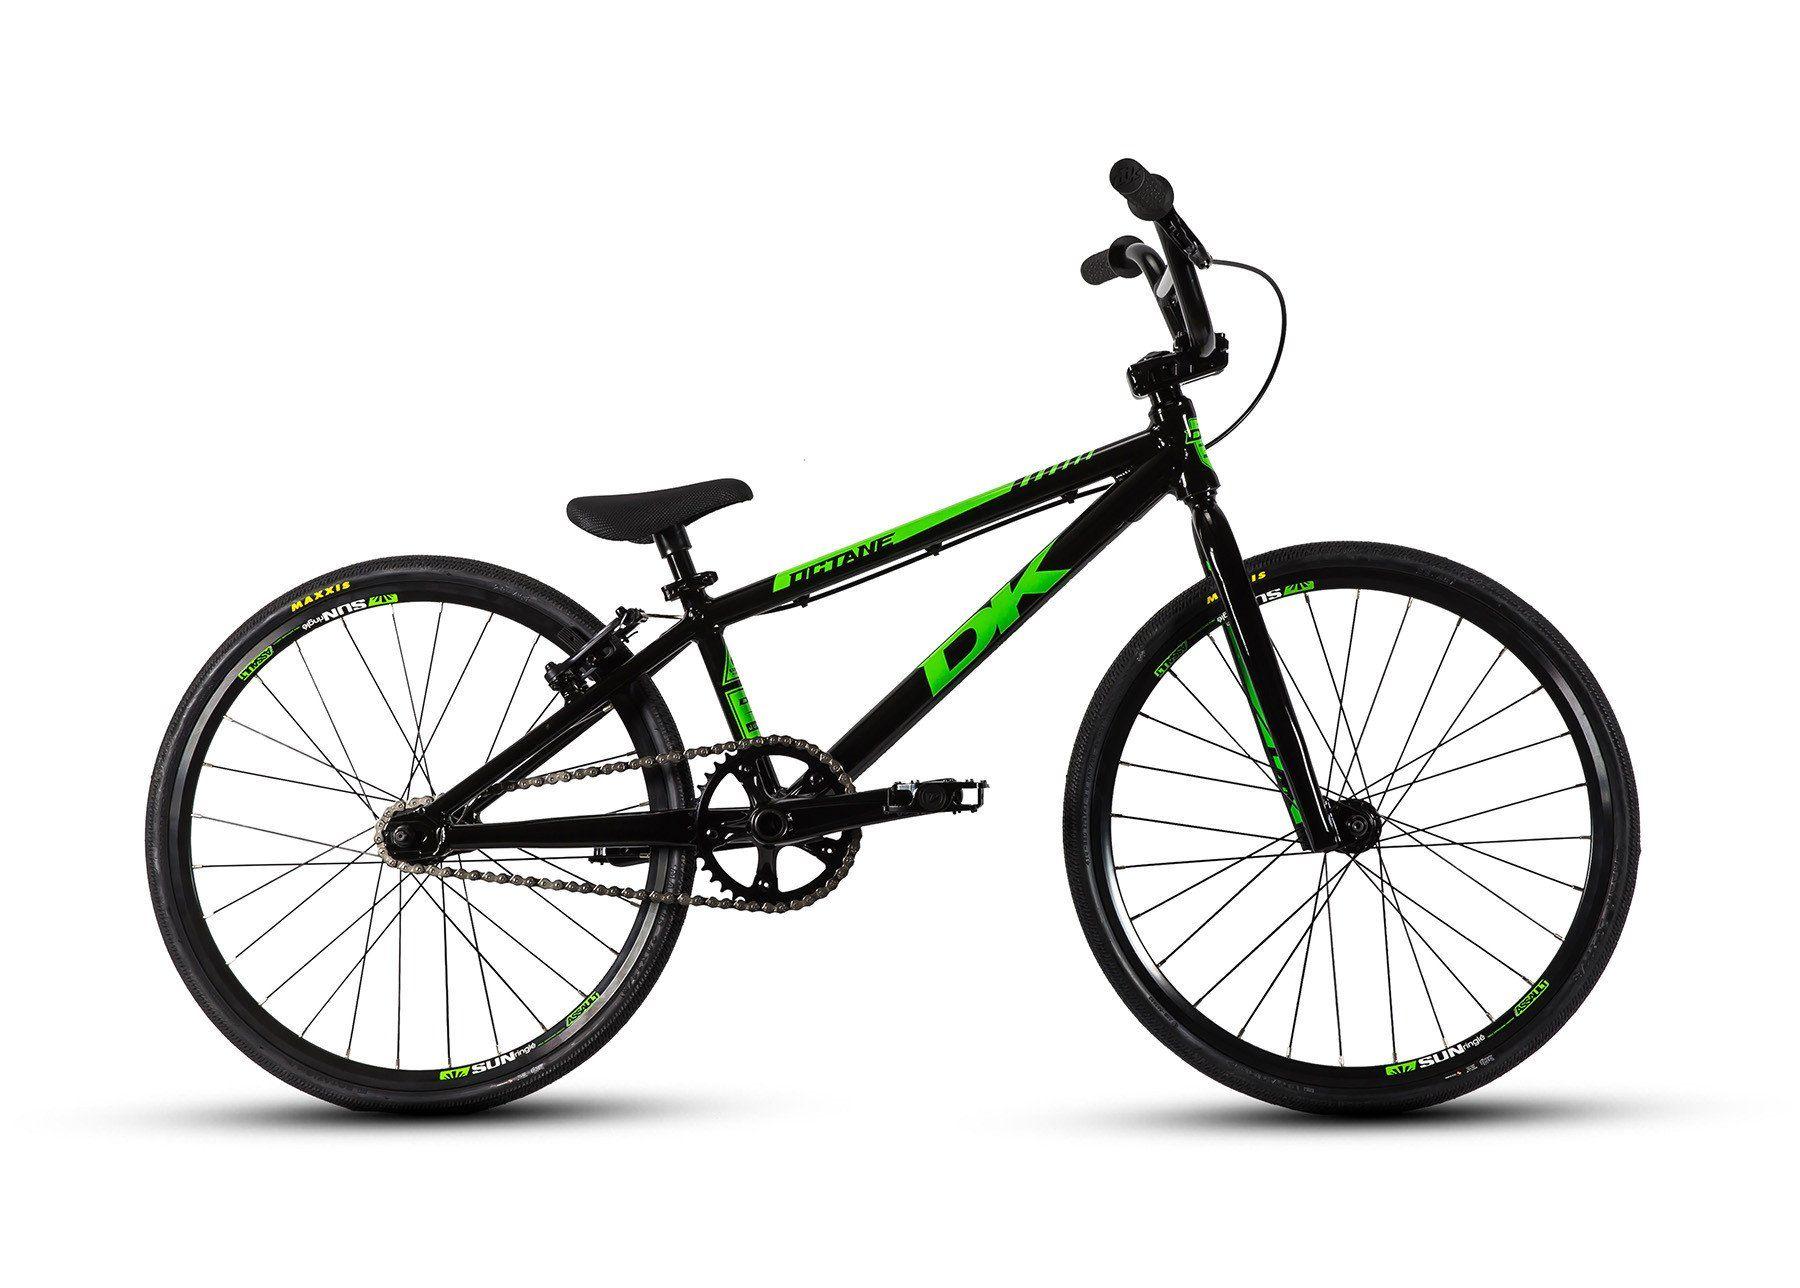 "2017 DK OCTANE JUNIOR 20"" Bike Мотоцикл"